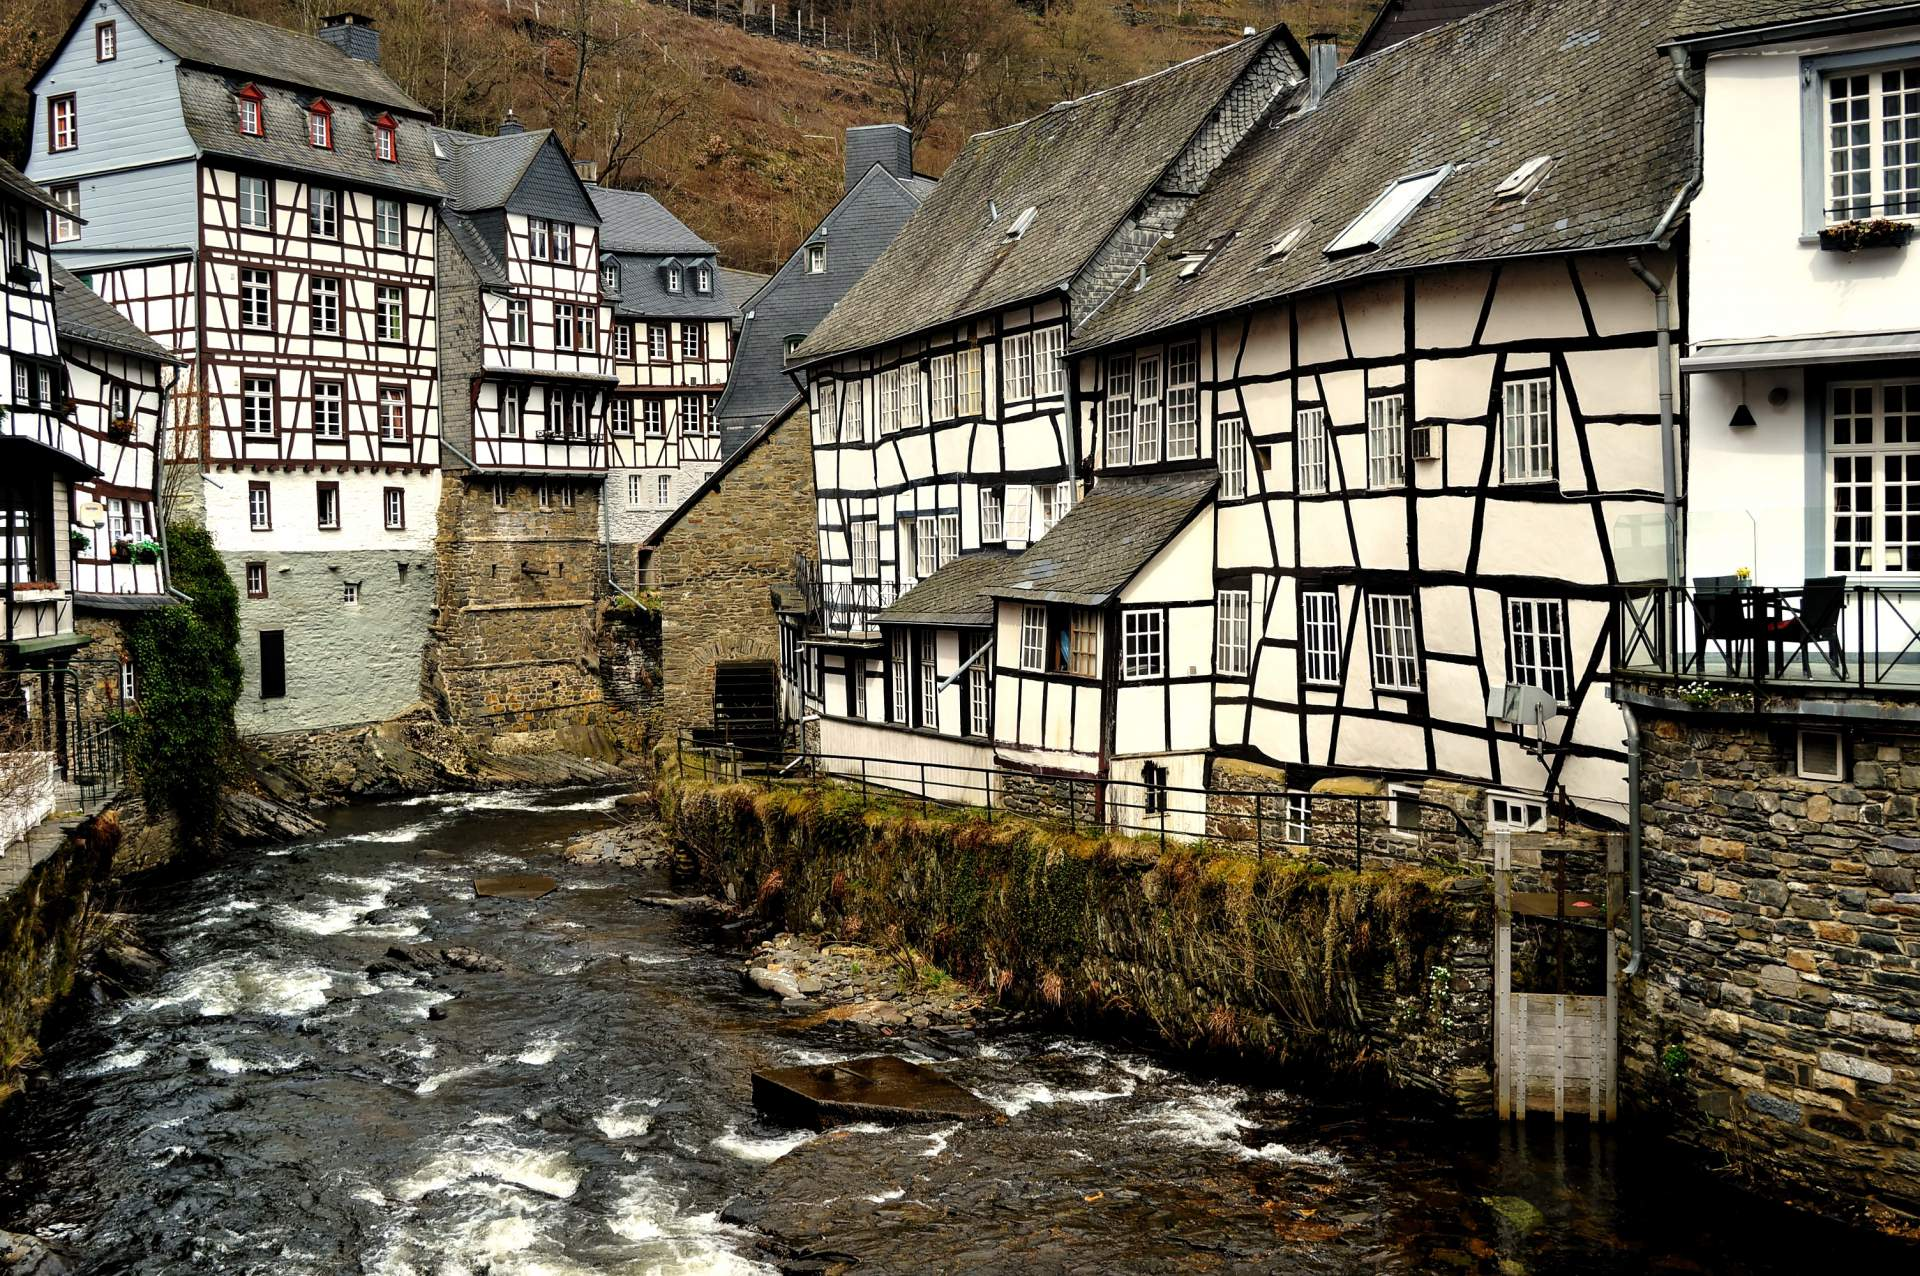 Busreis Eifel Monschau Einruhr dagtrip